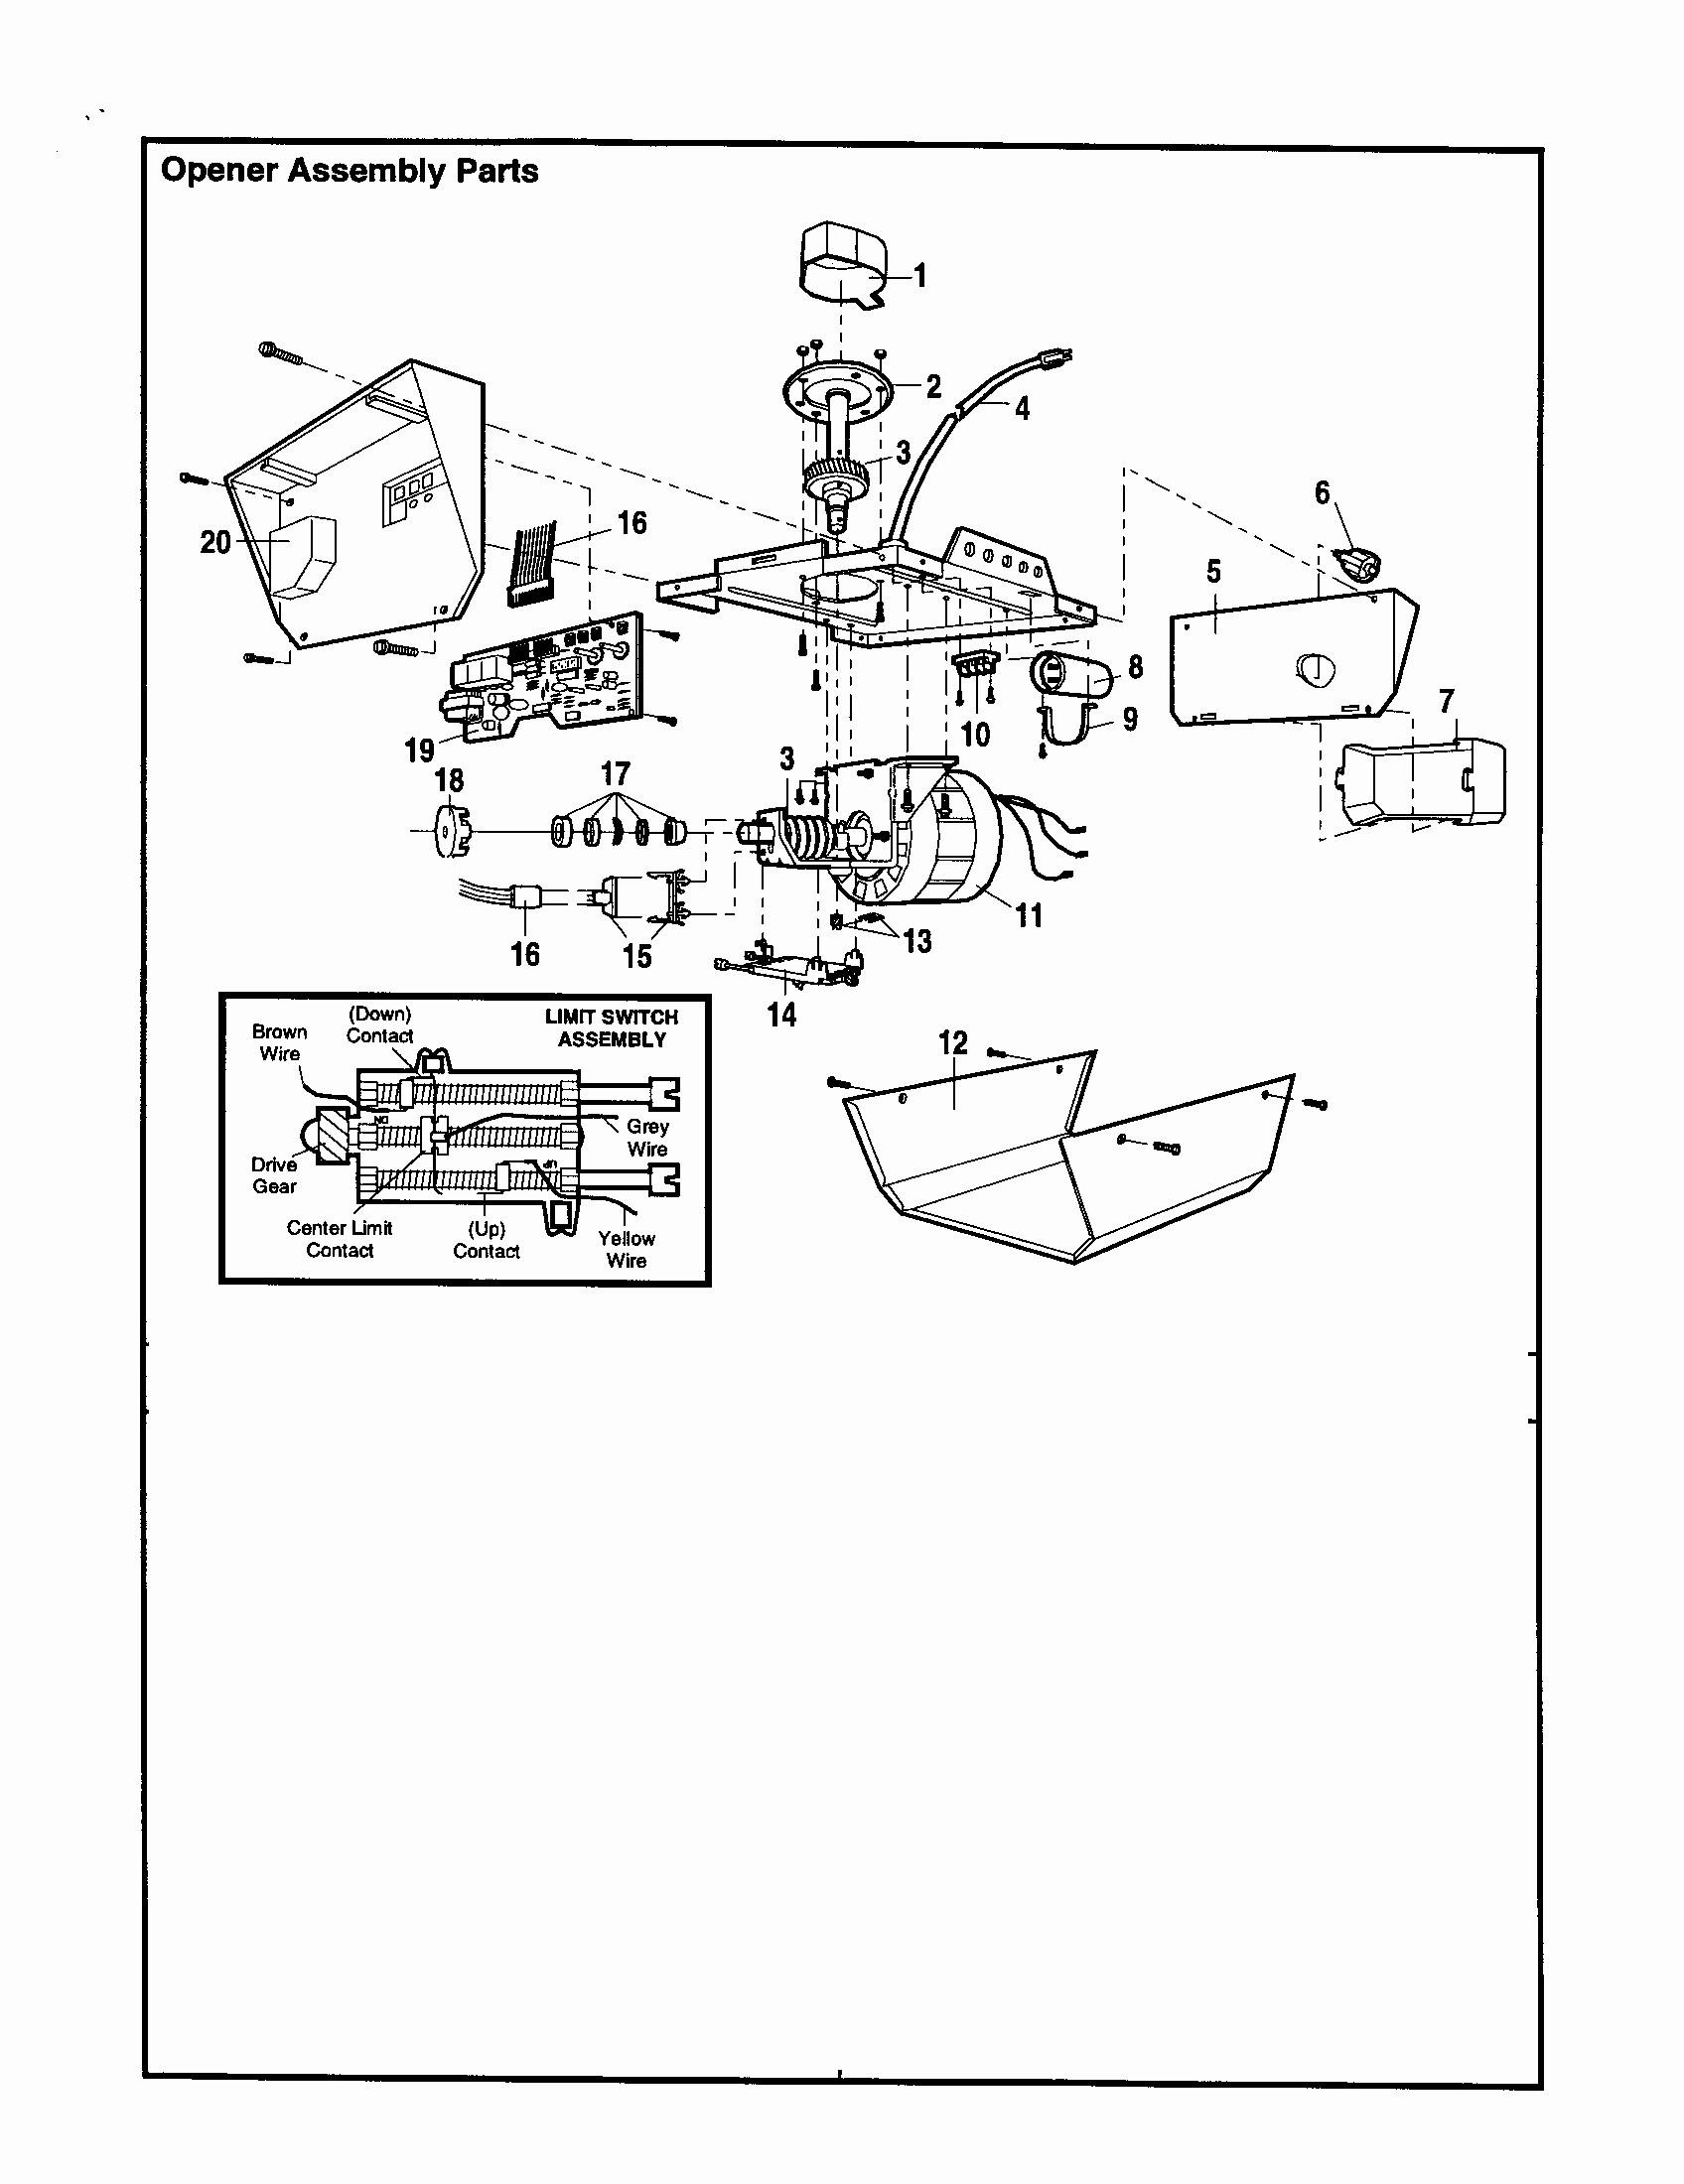 genie garage door parts diagram parrot mki9200 installation wiring opener my